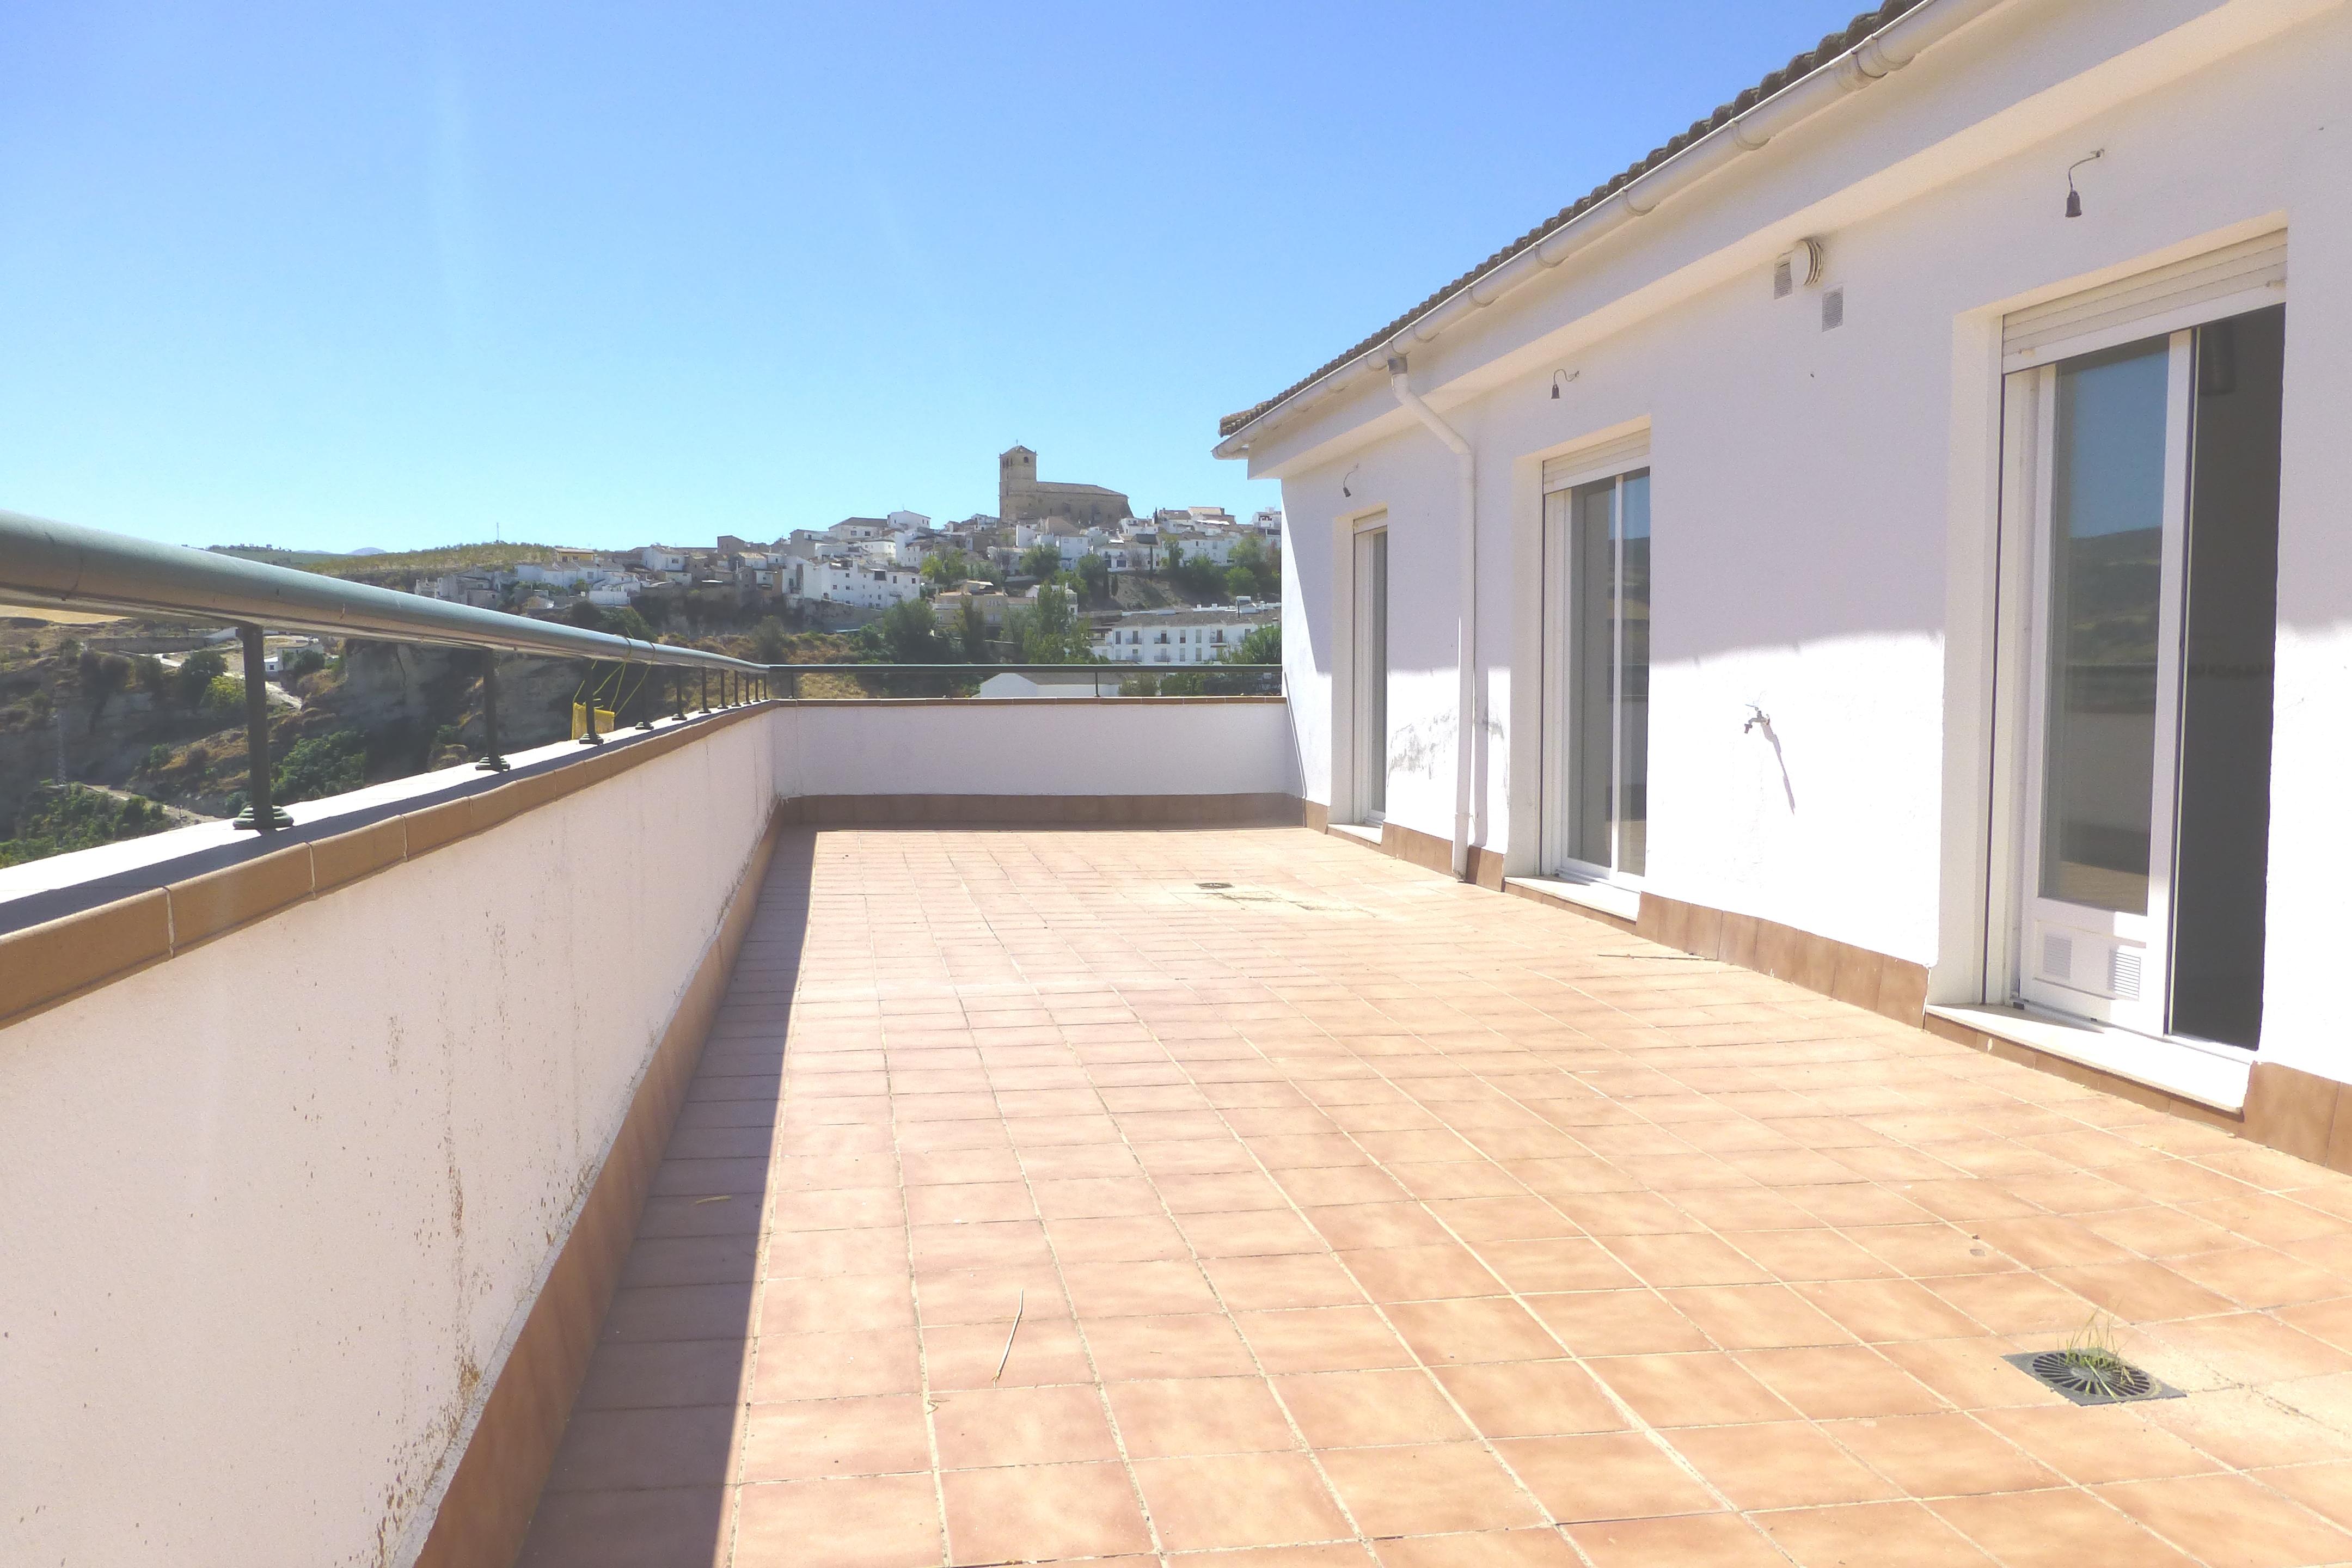 3 bedroom Apartment for sale in Alhama de Granada